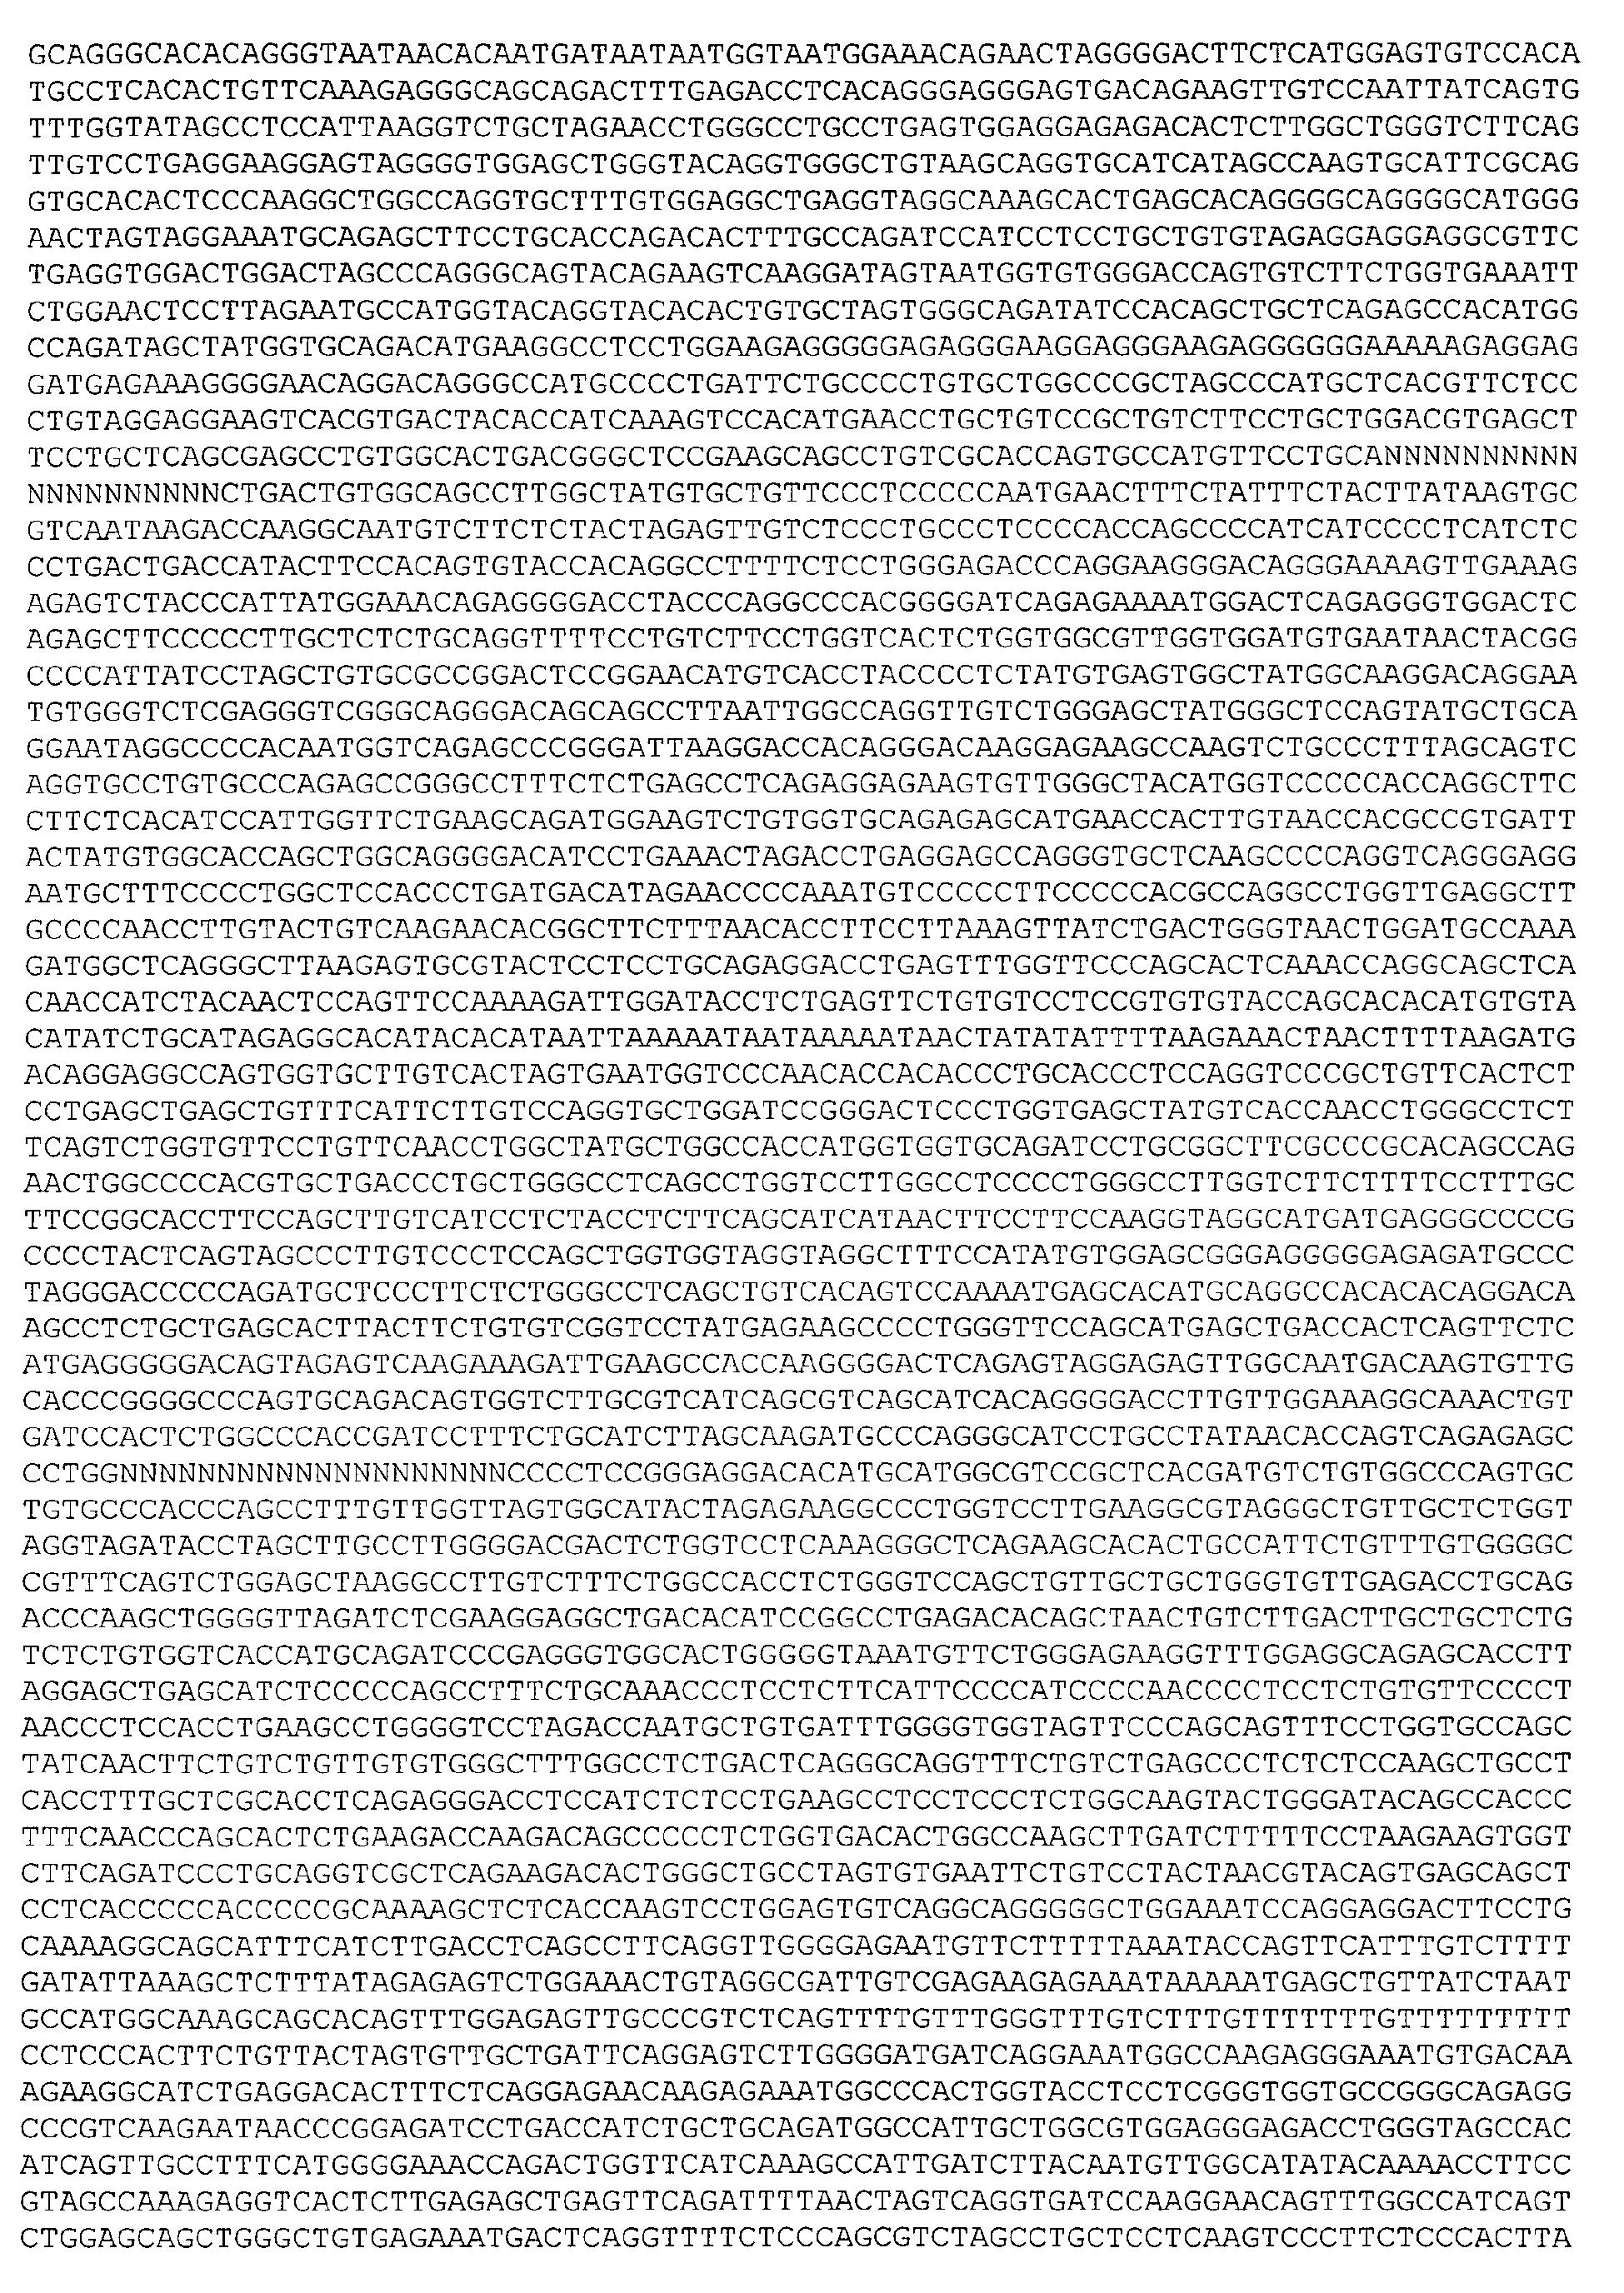 Figure imgb0284